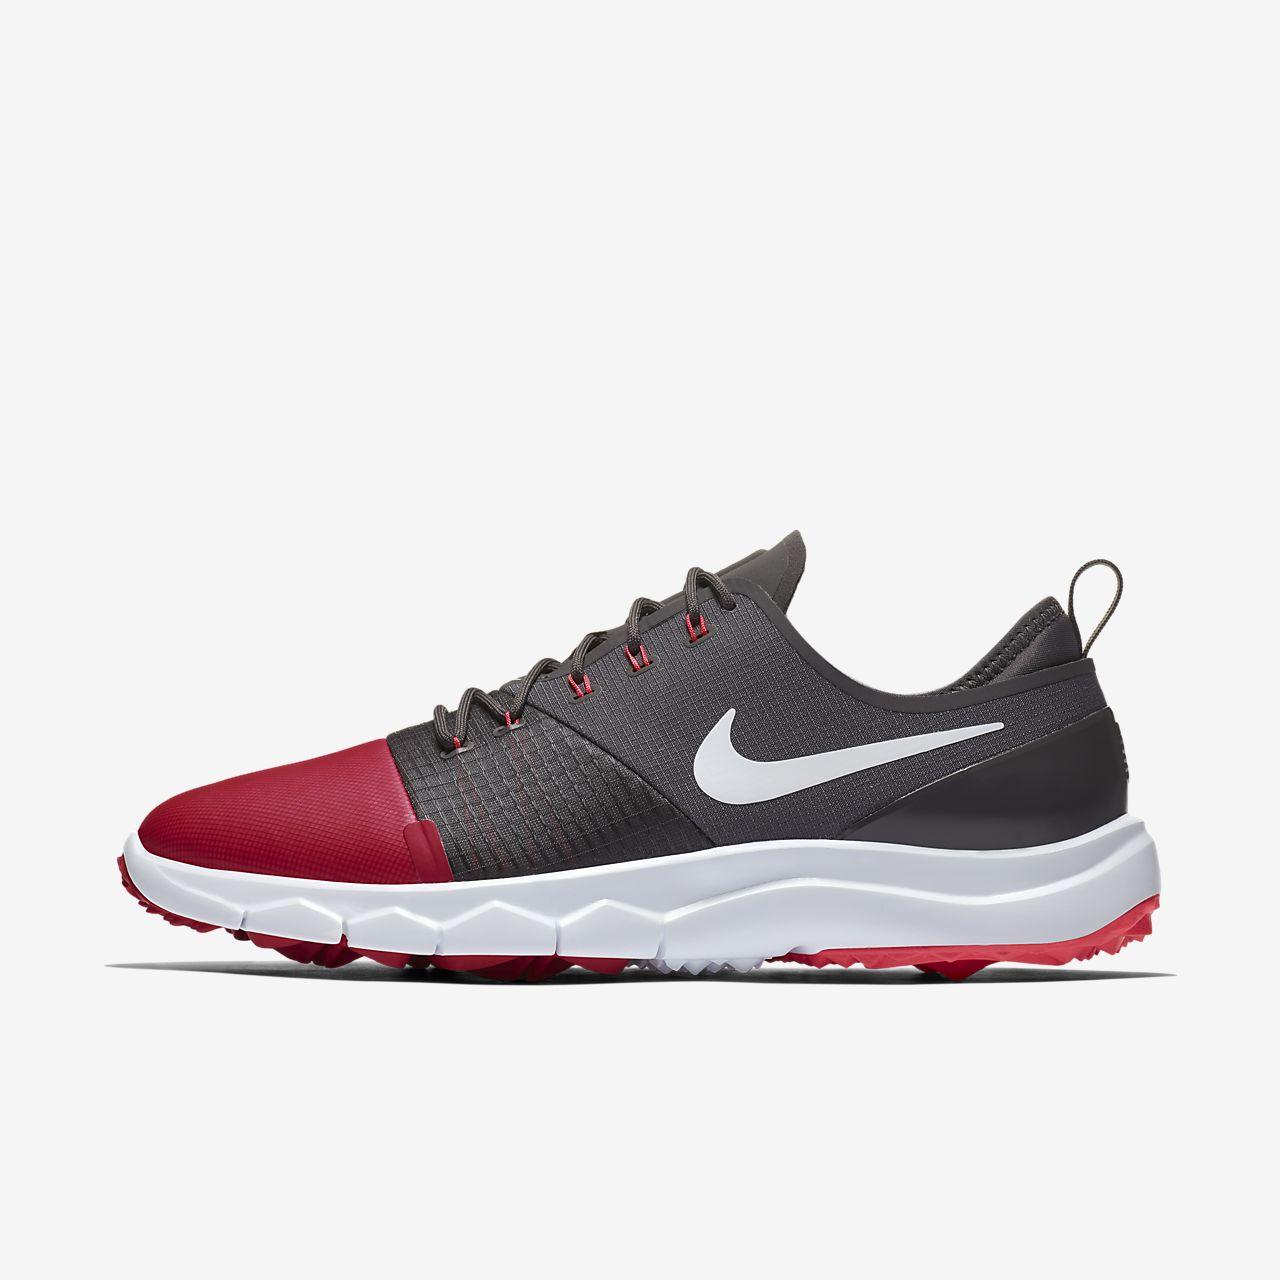 super popular def9f c102b Nike FI Impact 3 - golfsko til kvinder